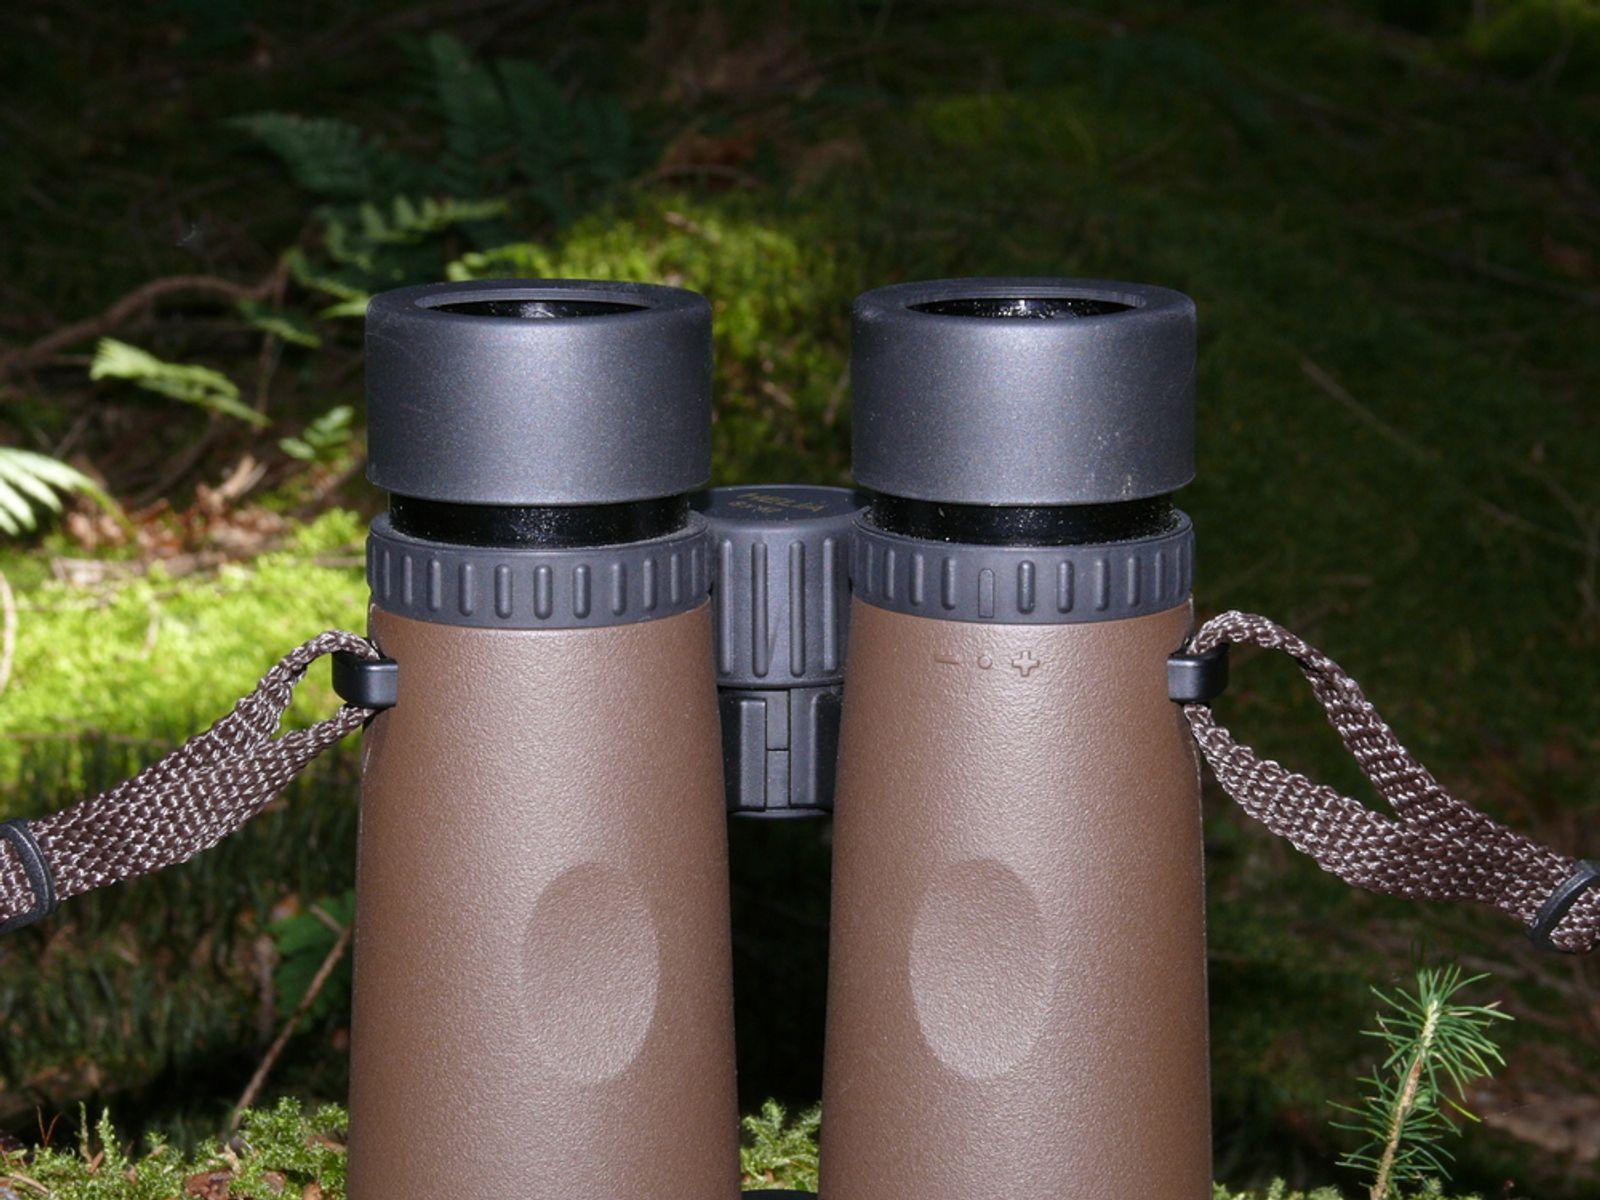 Kahles Fernglas Mit Entfernungsmesser Test : Das kahles helia fernglas 8x42